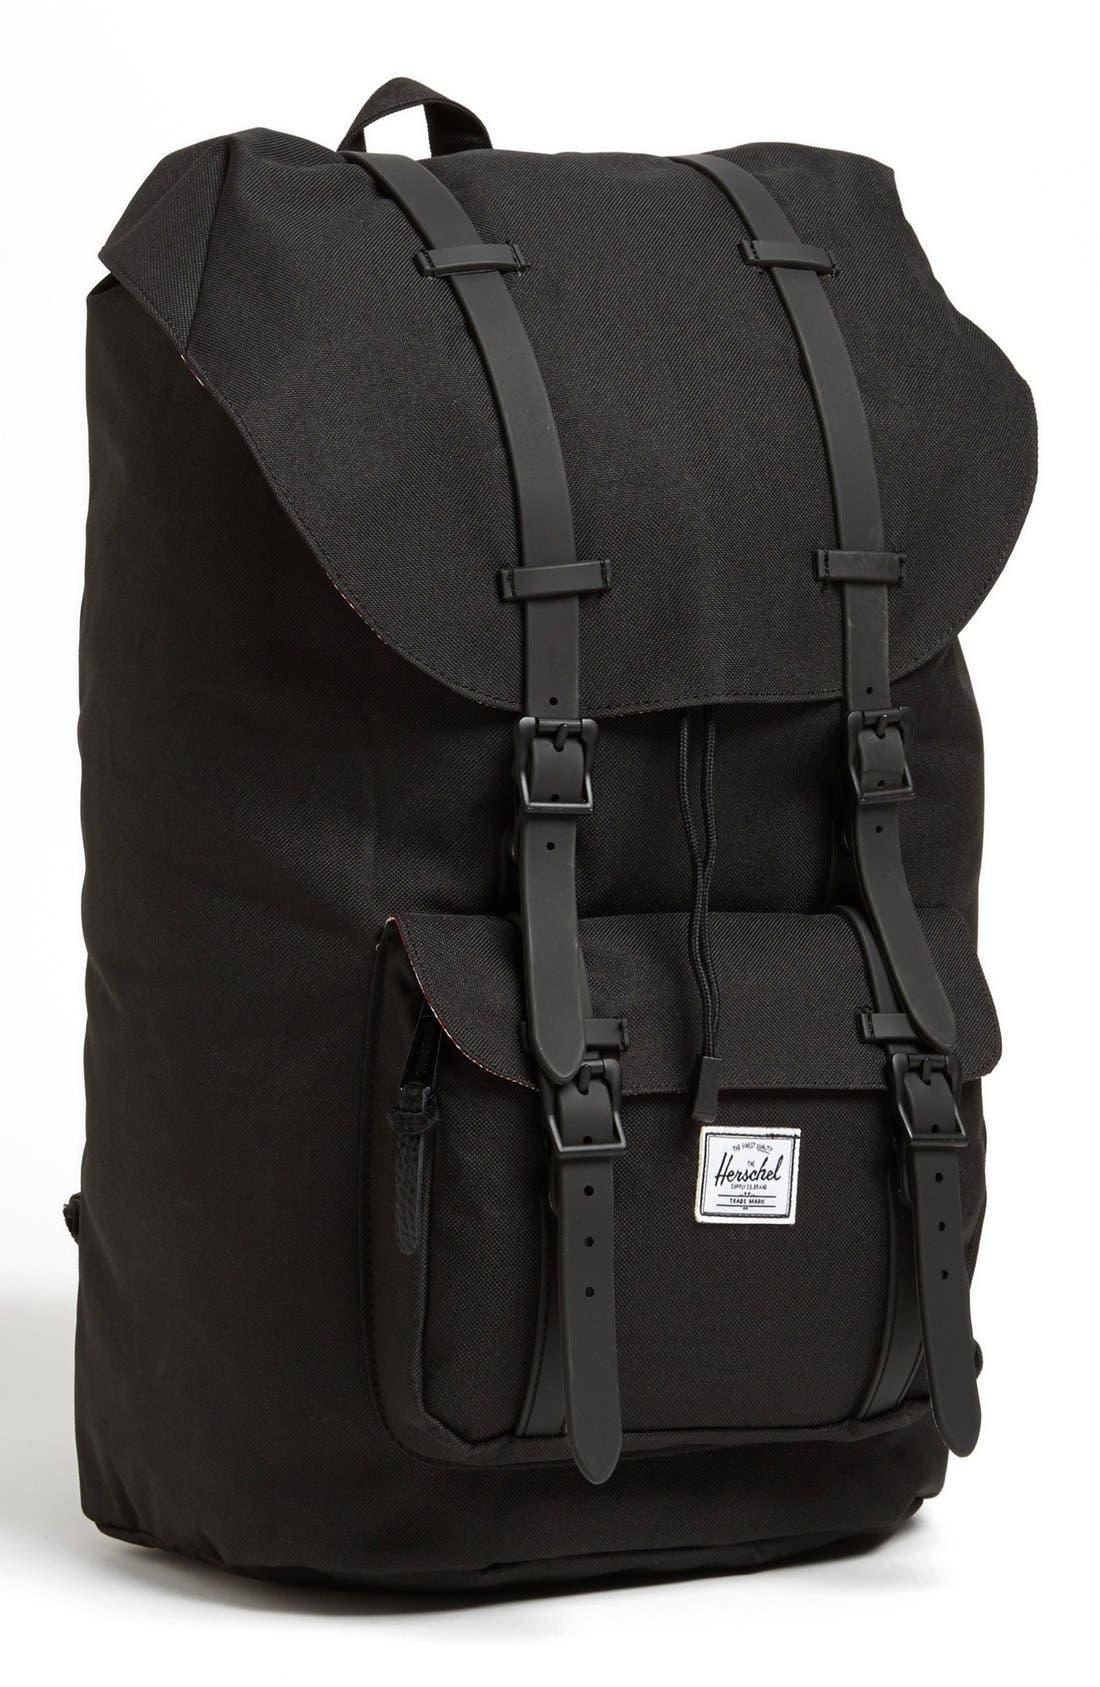 HERSCHEL SUPPLY CO. 'Little America' Backpack, Main, color, 003